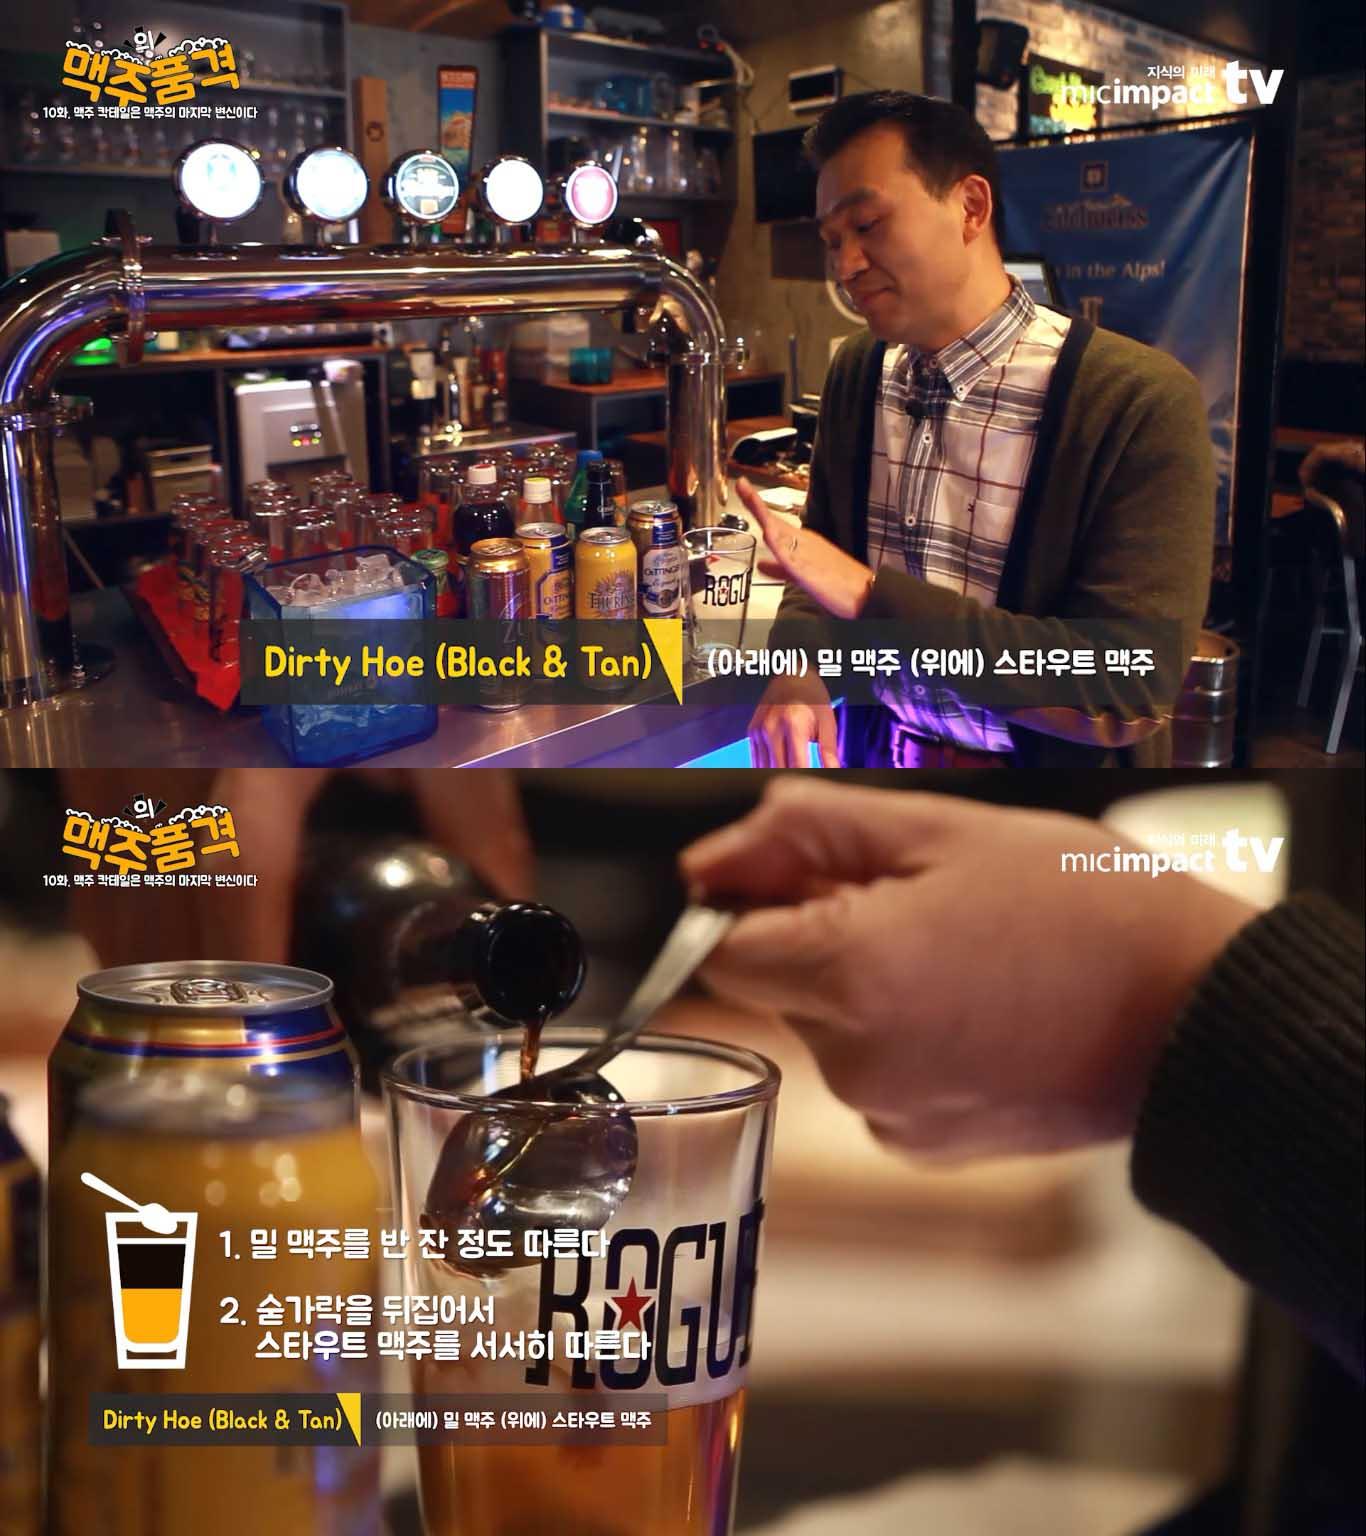 1. Dirty Hoe (Black & Tan) 下面 : 小麥啤酒 上面 : 黑啤 (一般多用豪格登和健力士~)